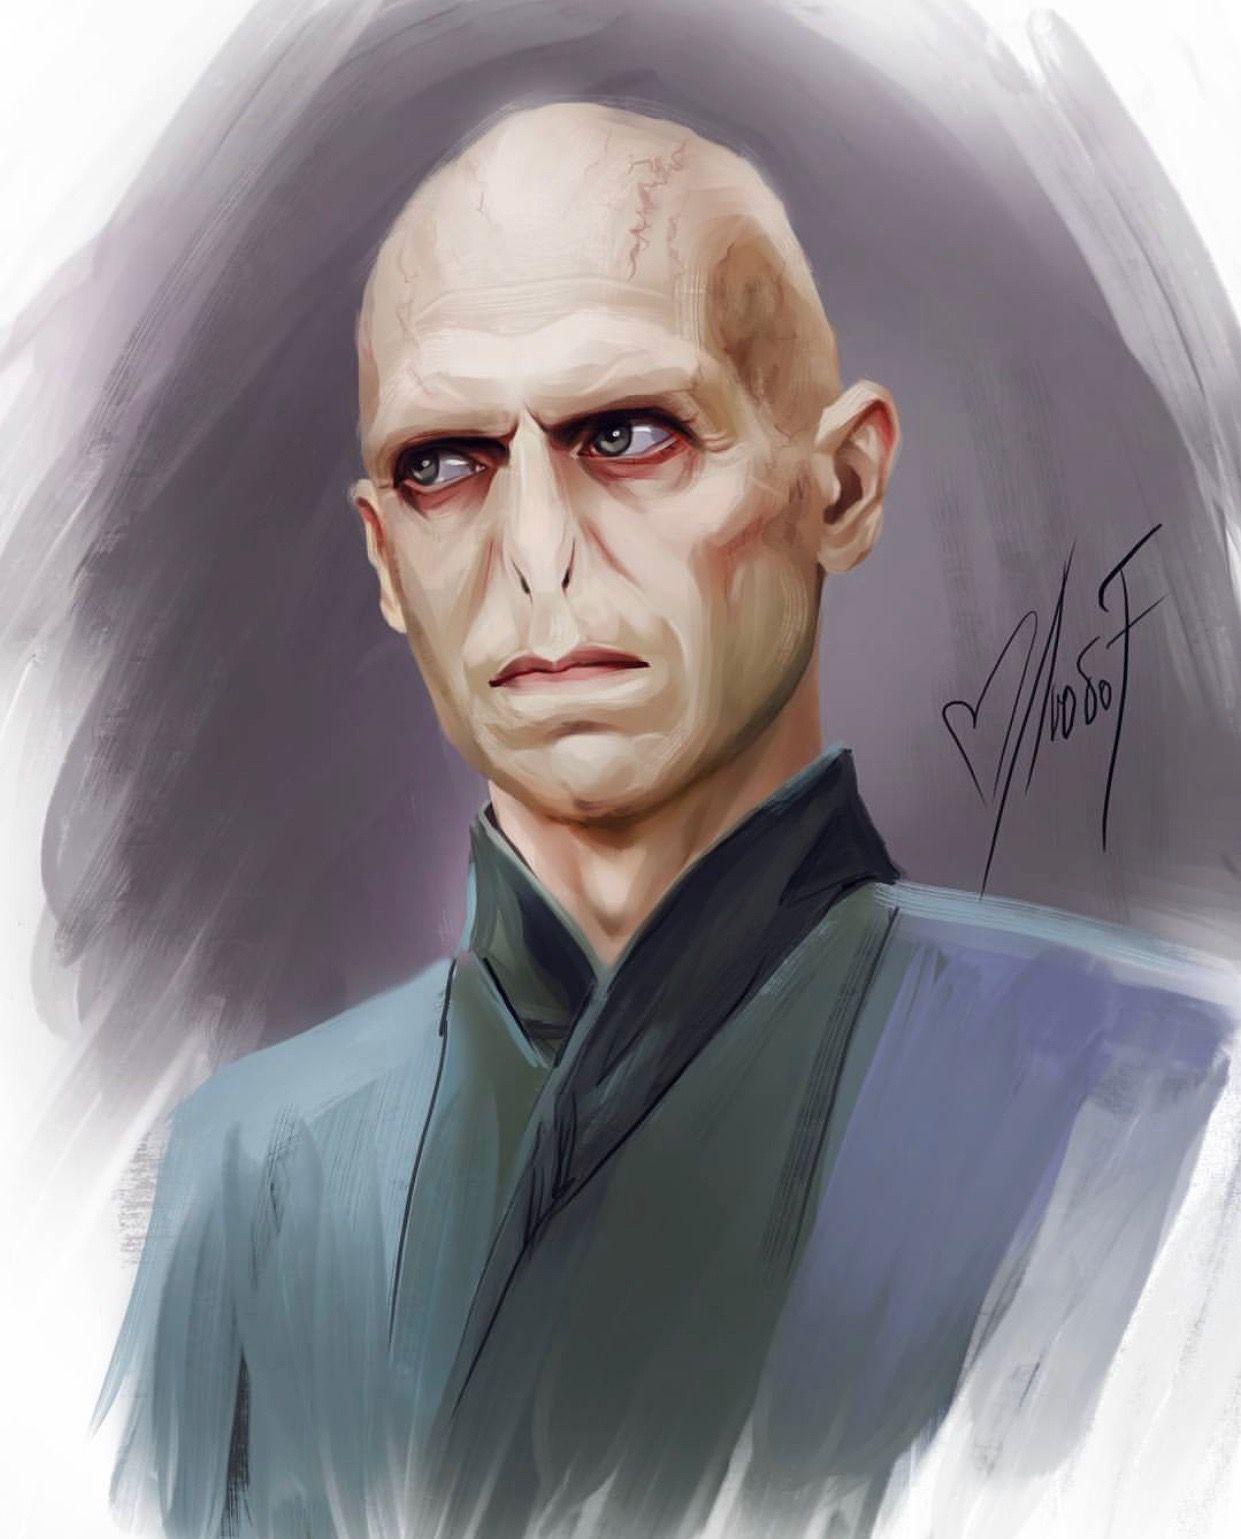 Liubofirst Hp Lord Voldemort Harry Potter Artwork Harry Potter Drawings Harry Potter Patronus